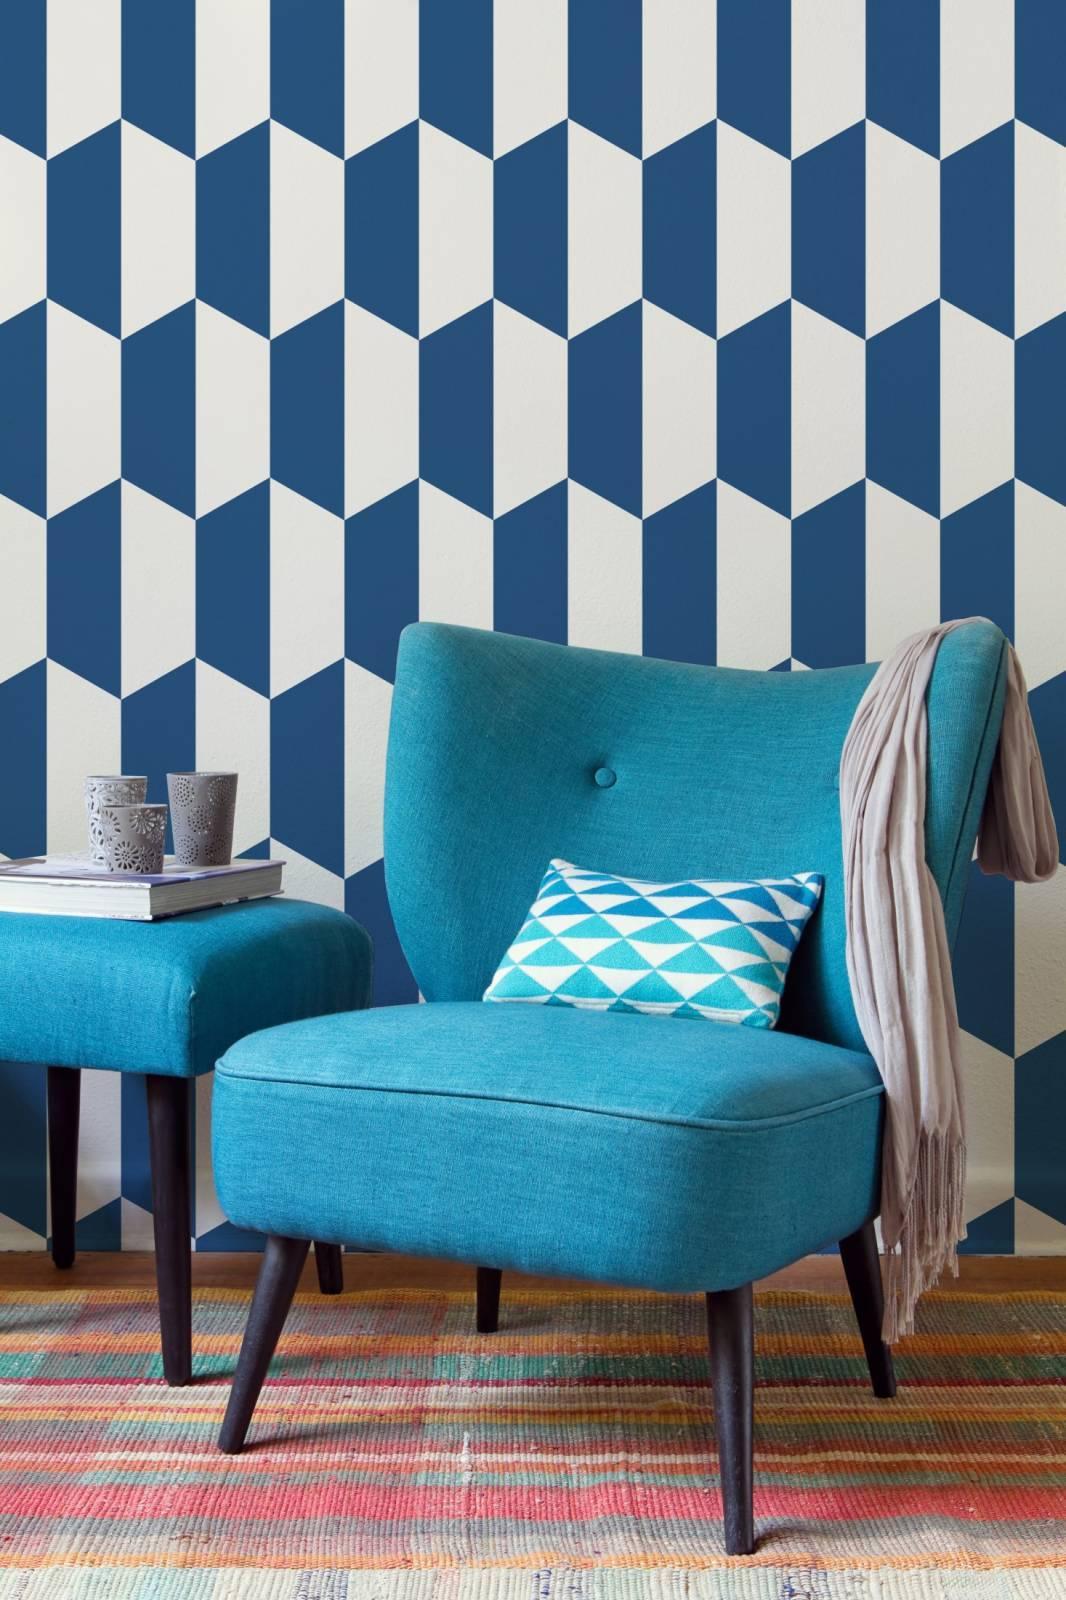 Papel de Parede Azul e Branco | Adesivo Vinilico imagem 2